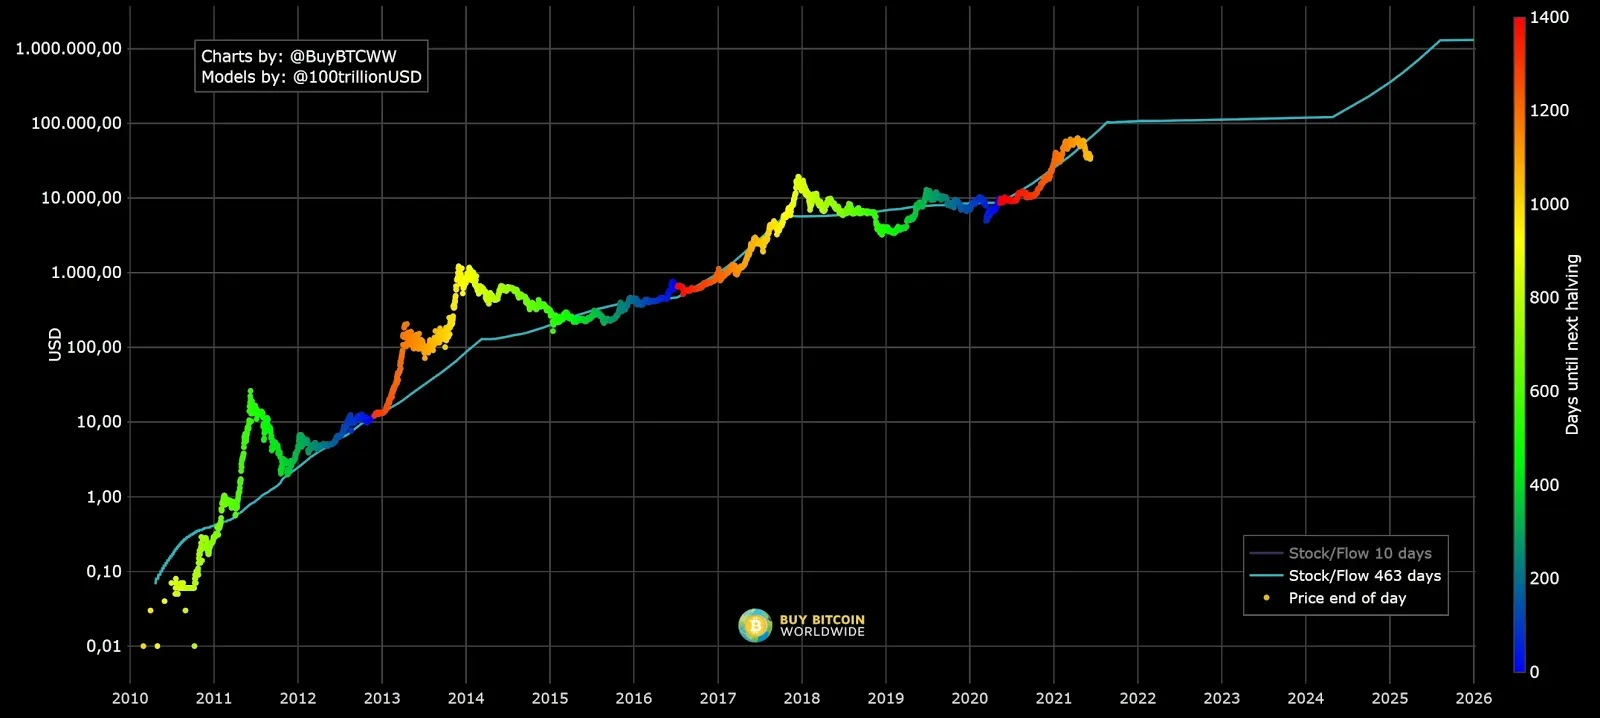 Stock to flow